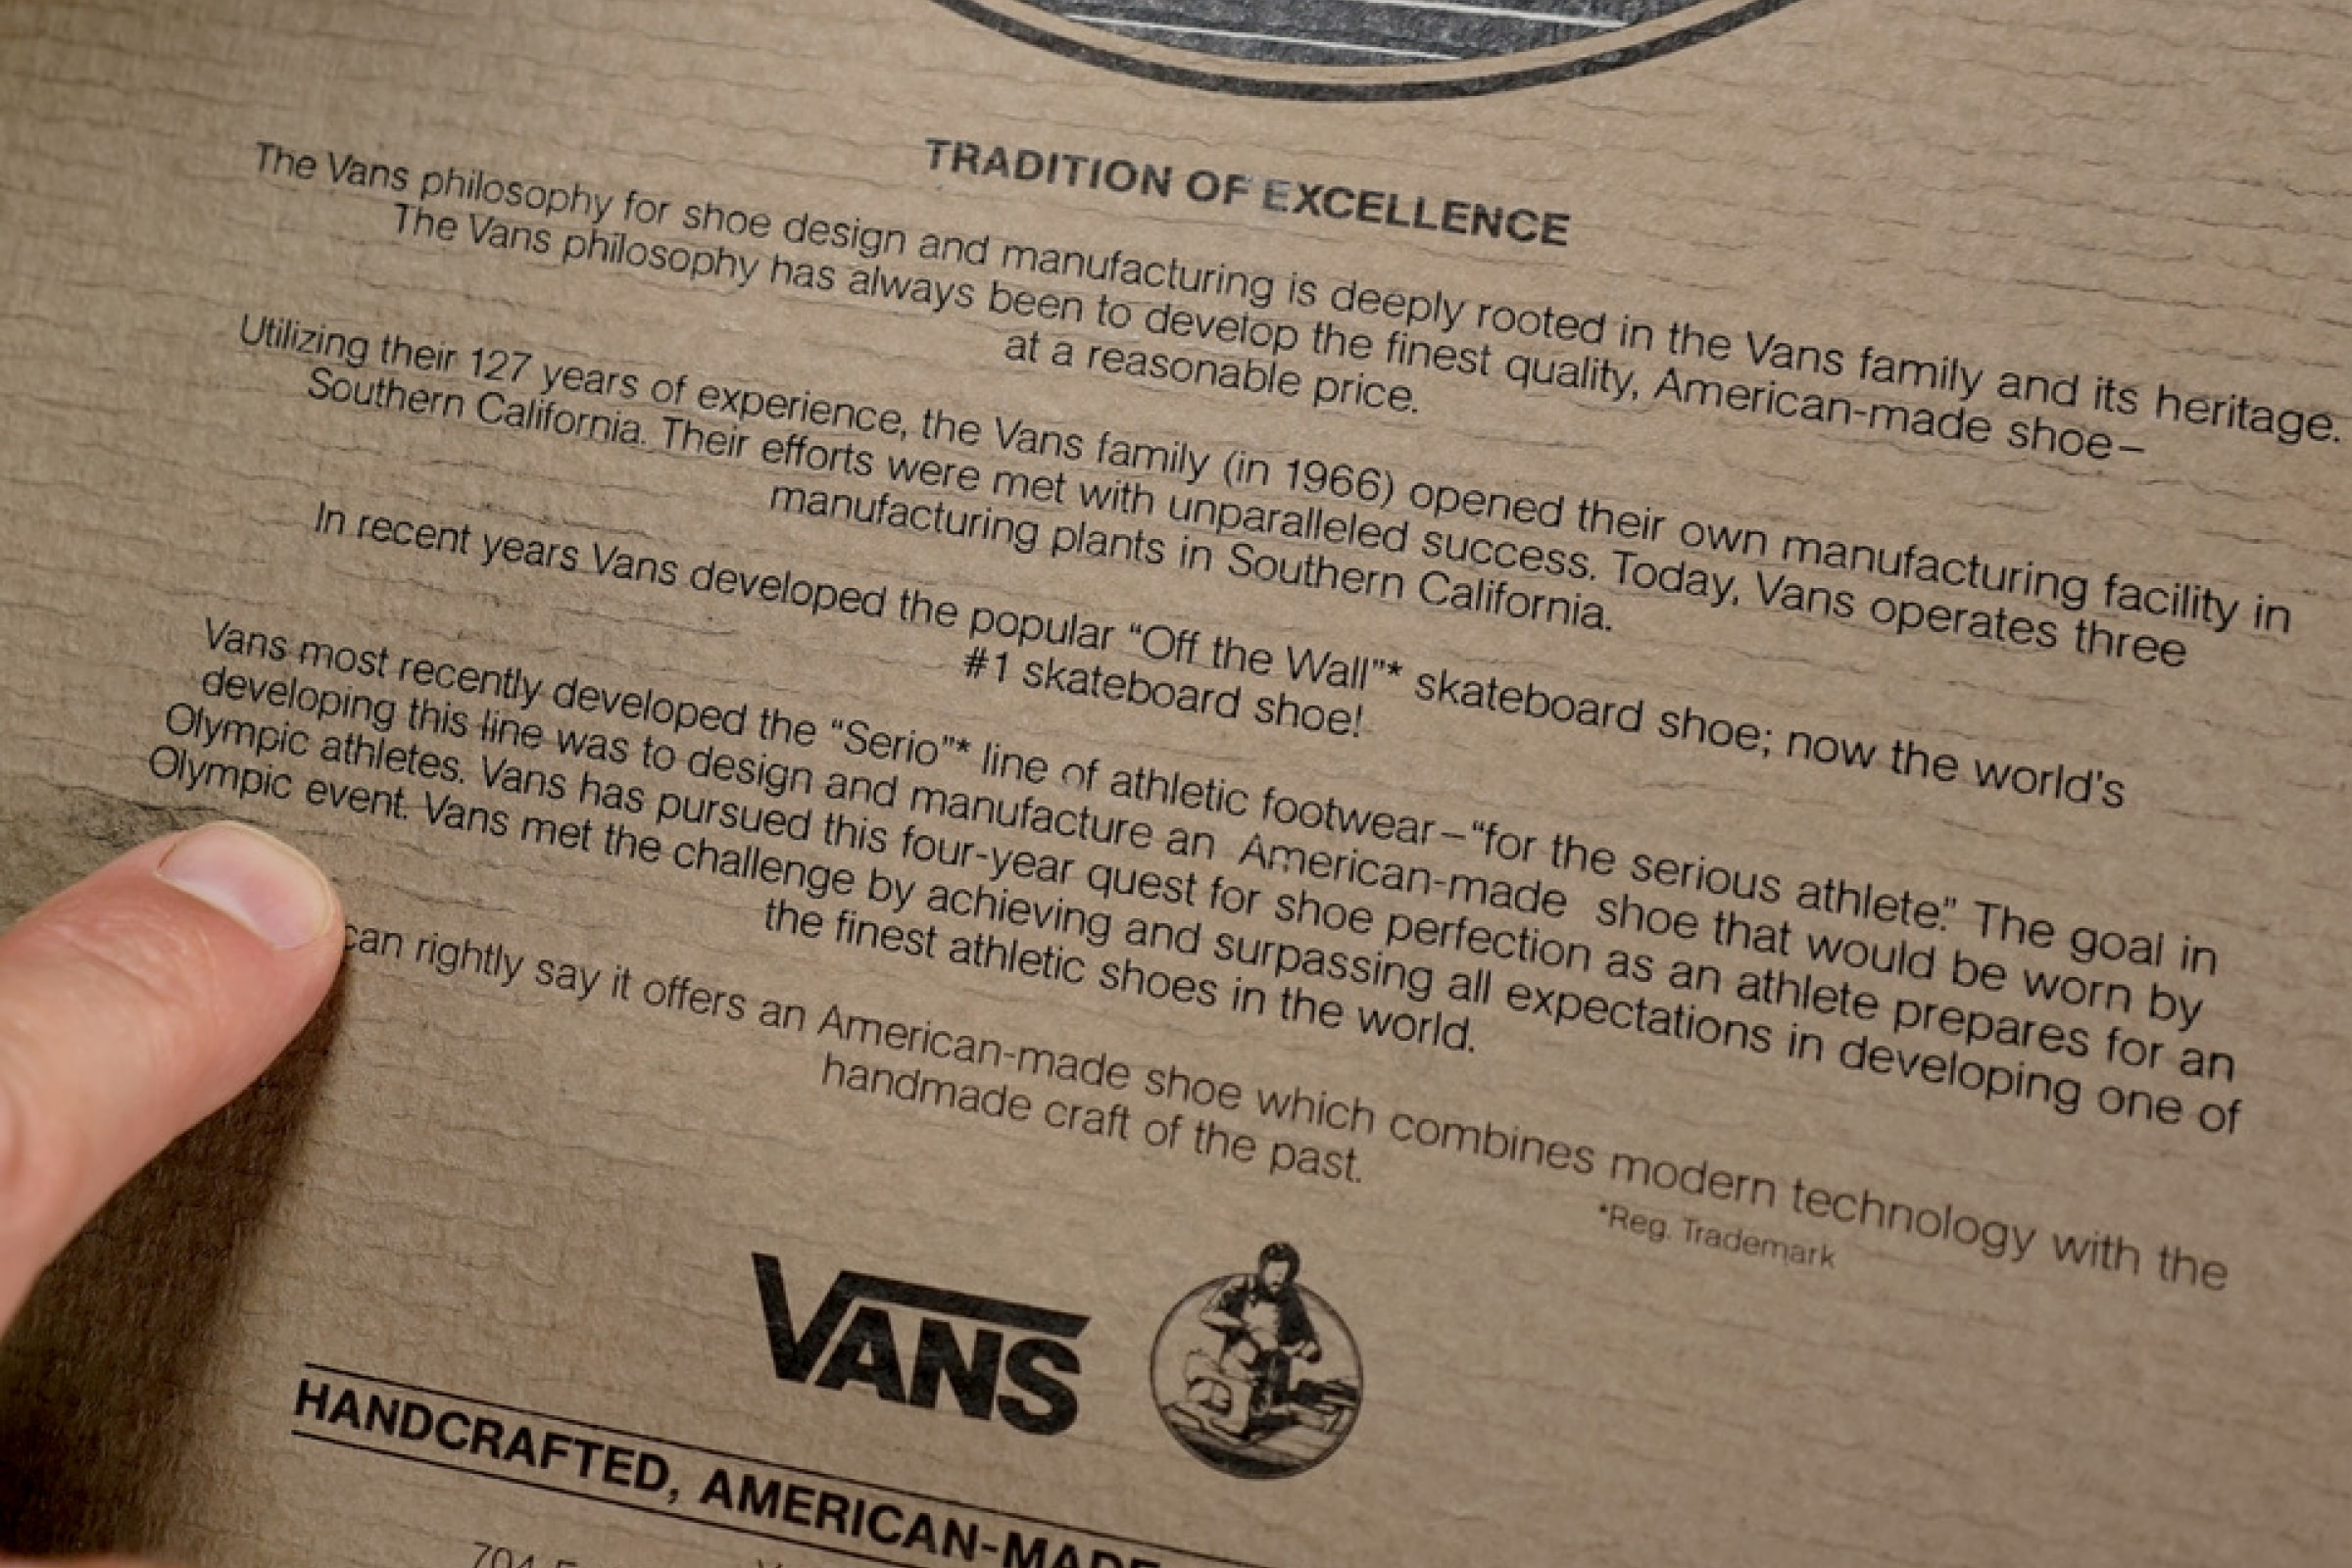 Vans statement